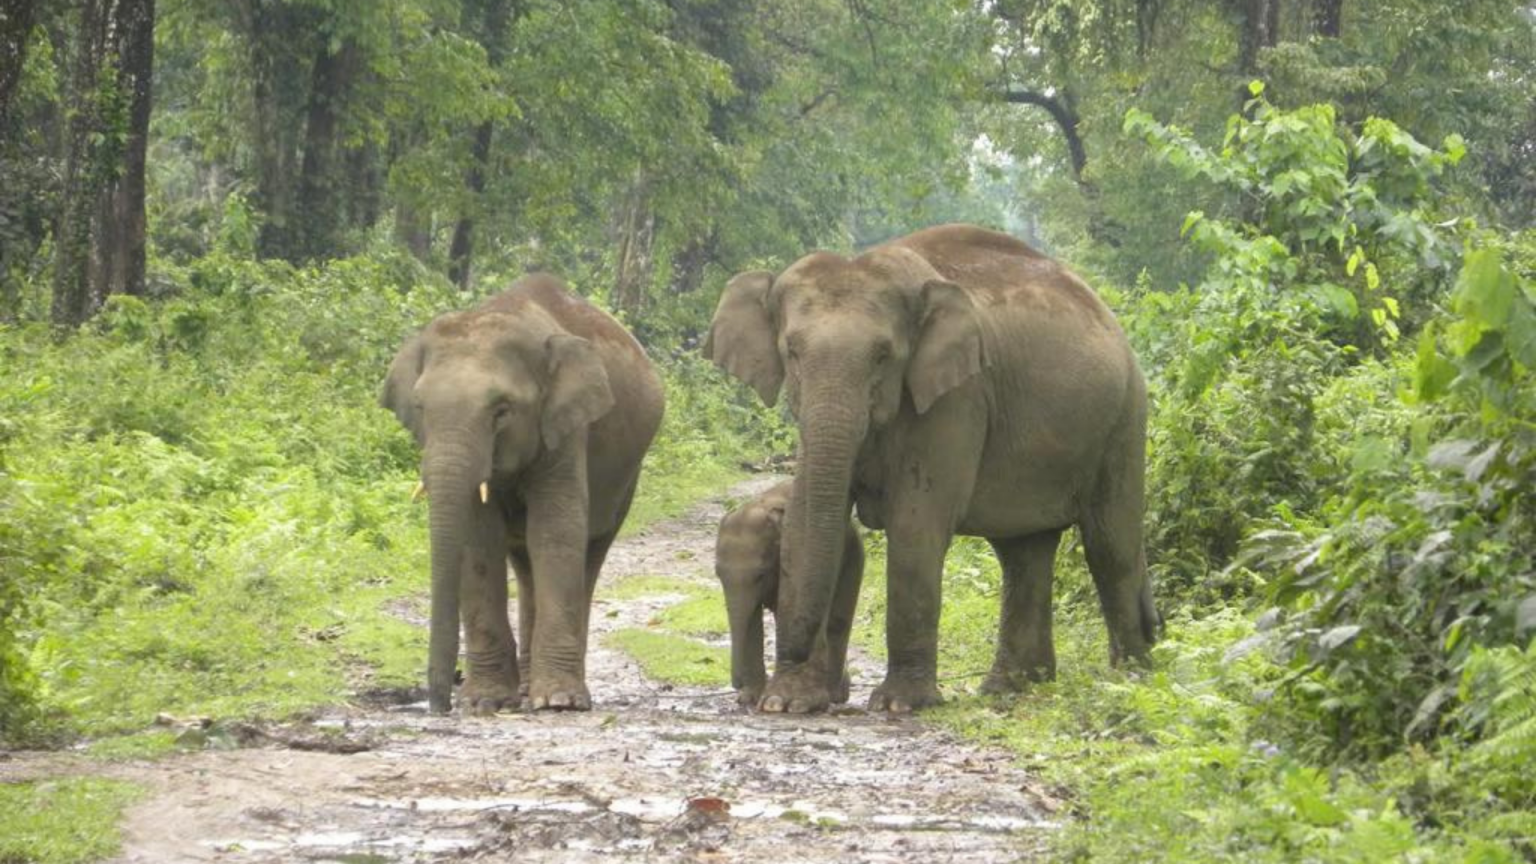 Assam gets its seventh national park with Dehing Patkai | അസമിന് ഏഴാമത്തെ ദേശീയ ഉദ്യാനം ഡെഹിംഗ് പട്കായിക്കൊപ്പമുണ്ട്_40.1